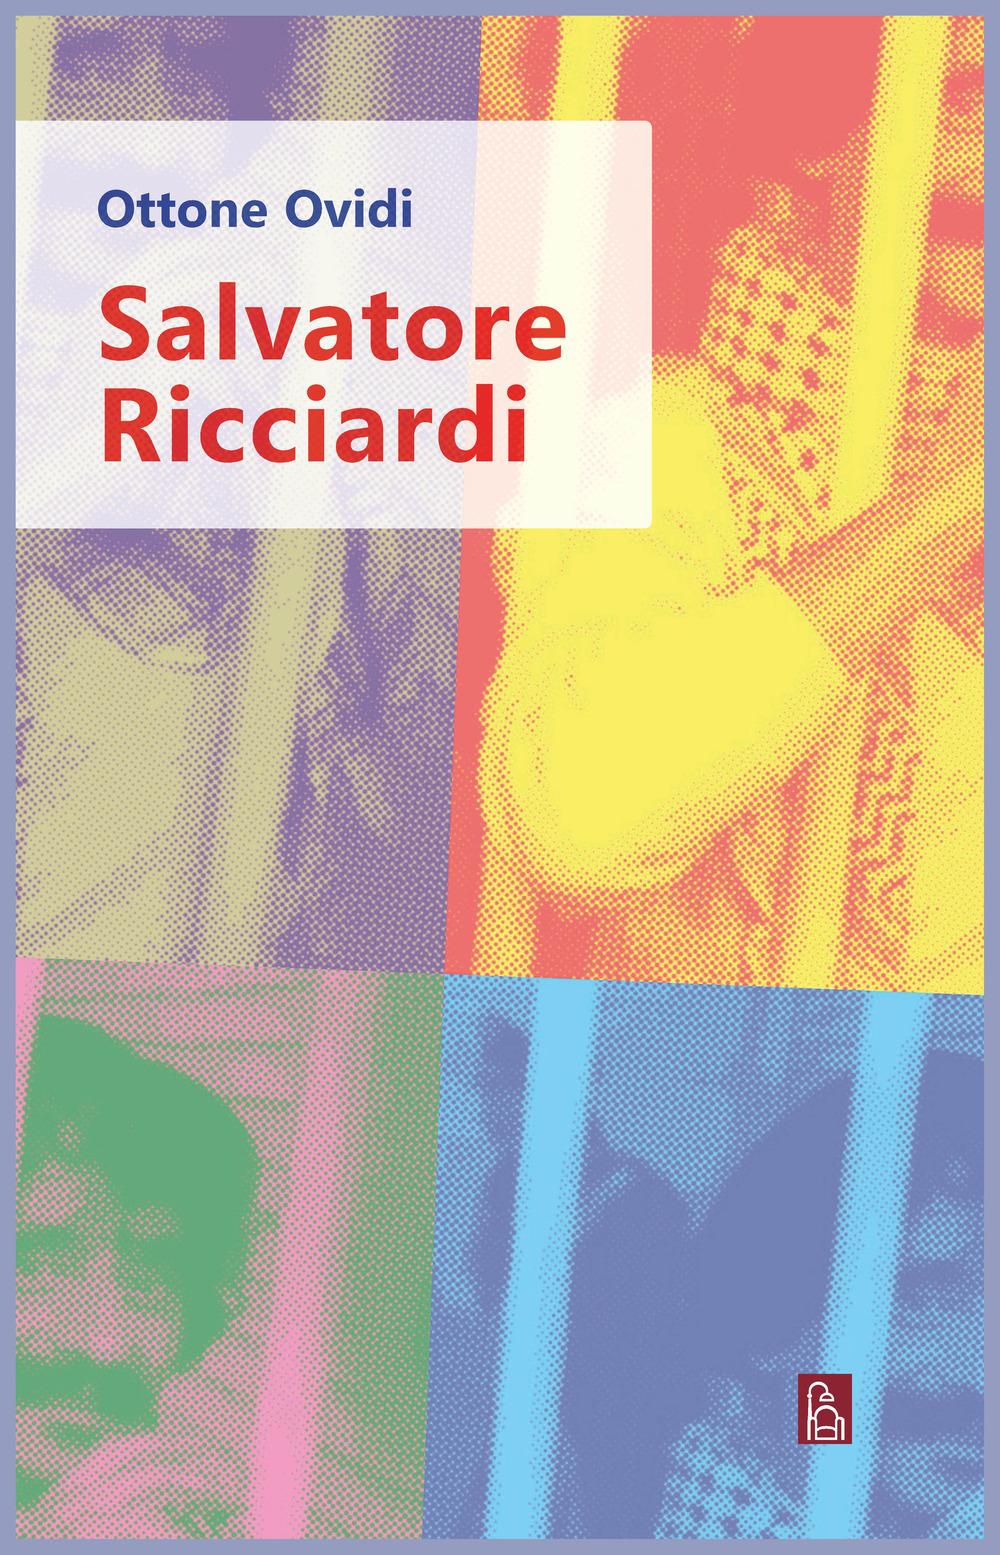 SALVATORE RICCIARDI - 9788899641757